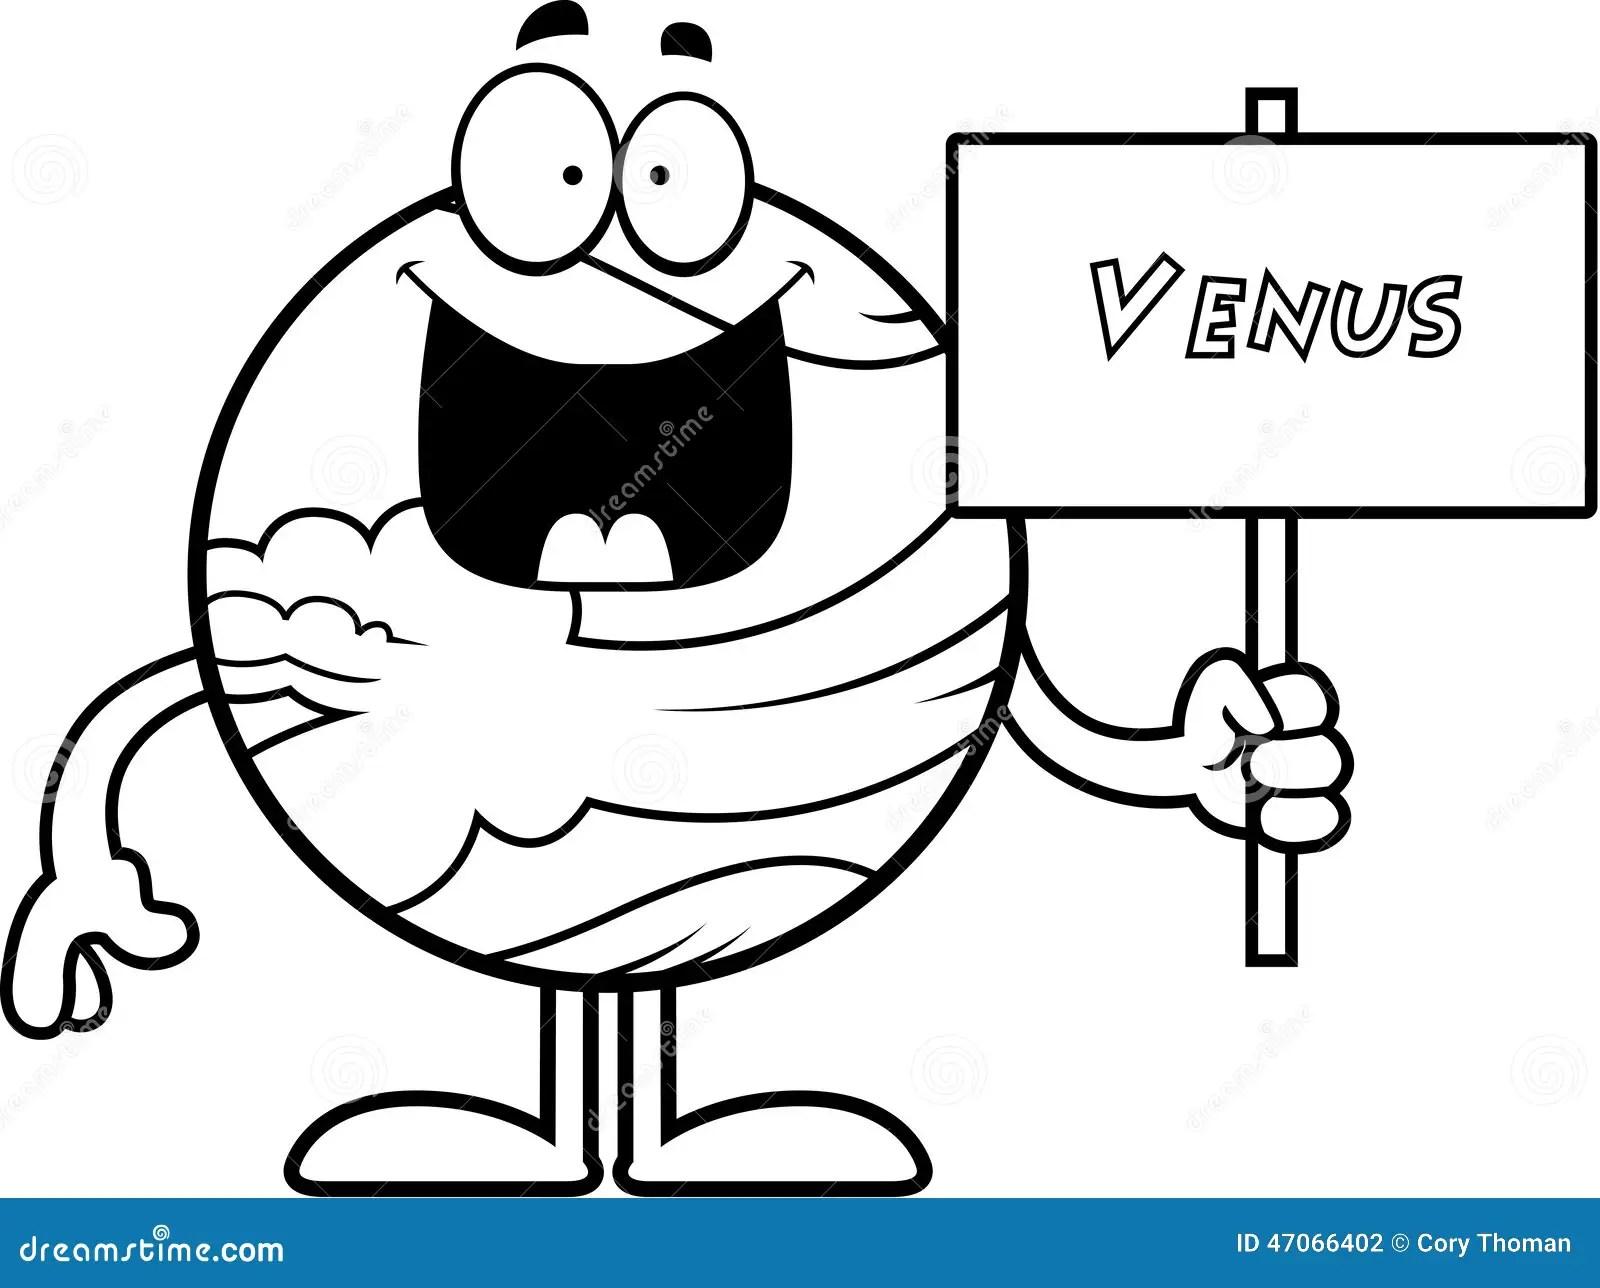 Cartoon Venus Sign Stock Vector Illustration Of Smiling